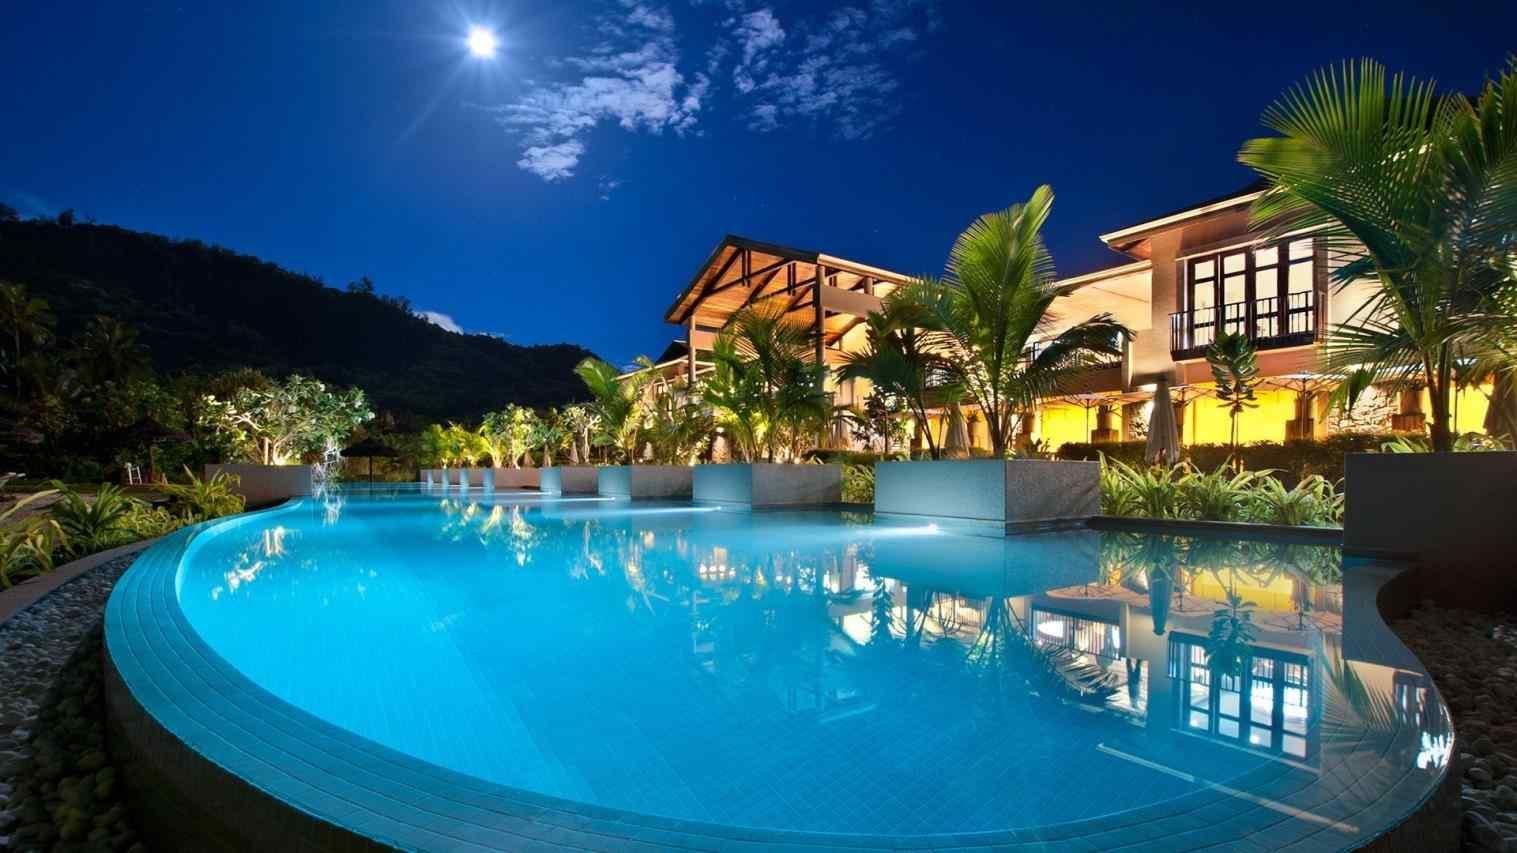 seasons-resort-blog-travel-seychelles-hotels-five-star-four-seasons-resort-blog-luxury-hotel-luxury-seychelles-hotels-five-star-hotel-banyan-tree-a.jpg